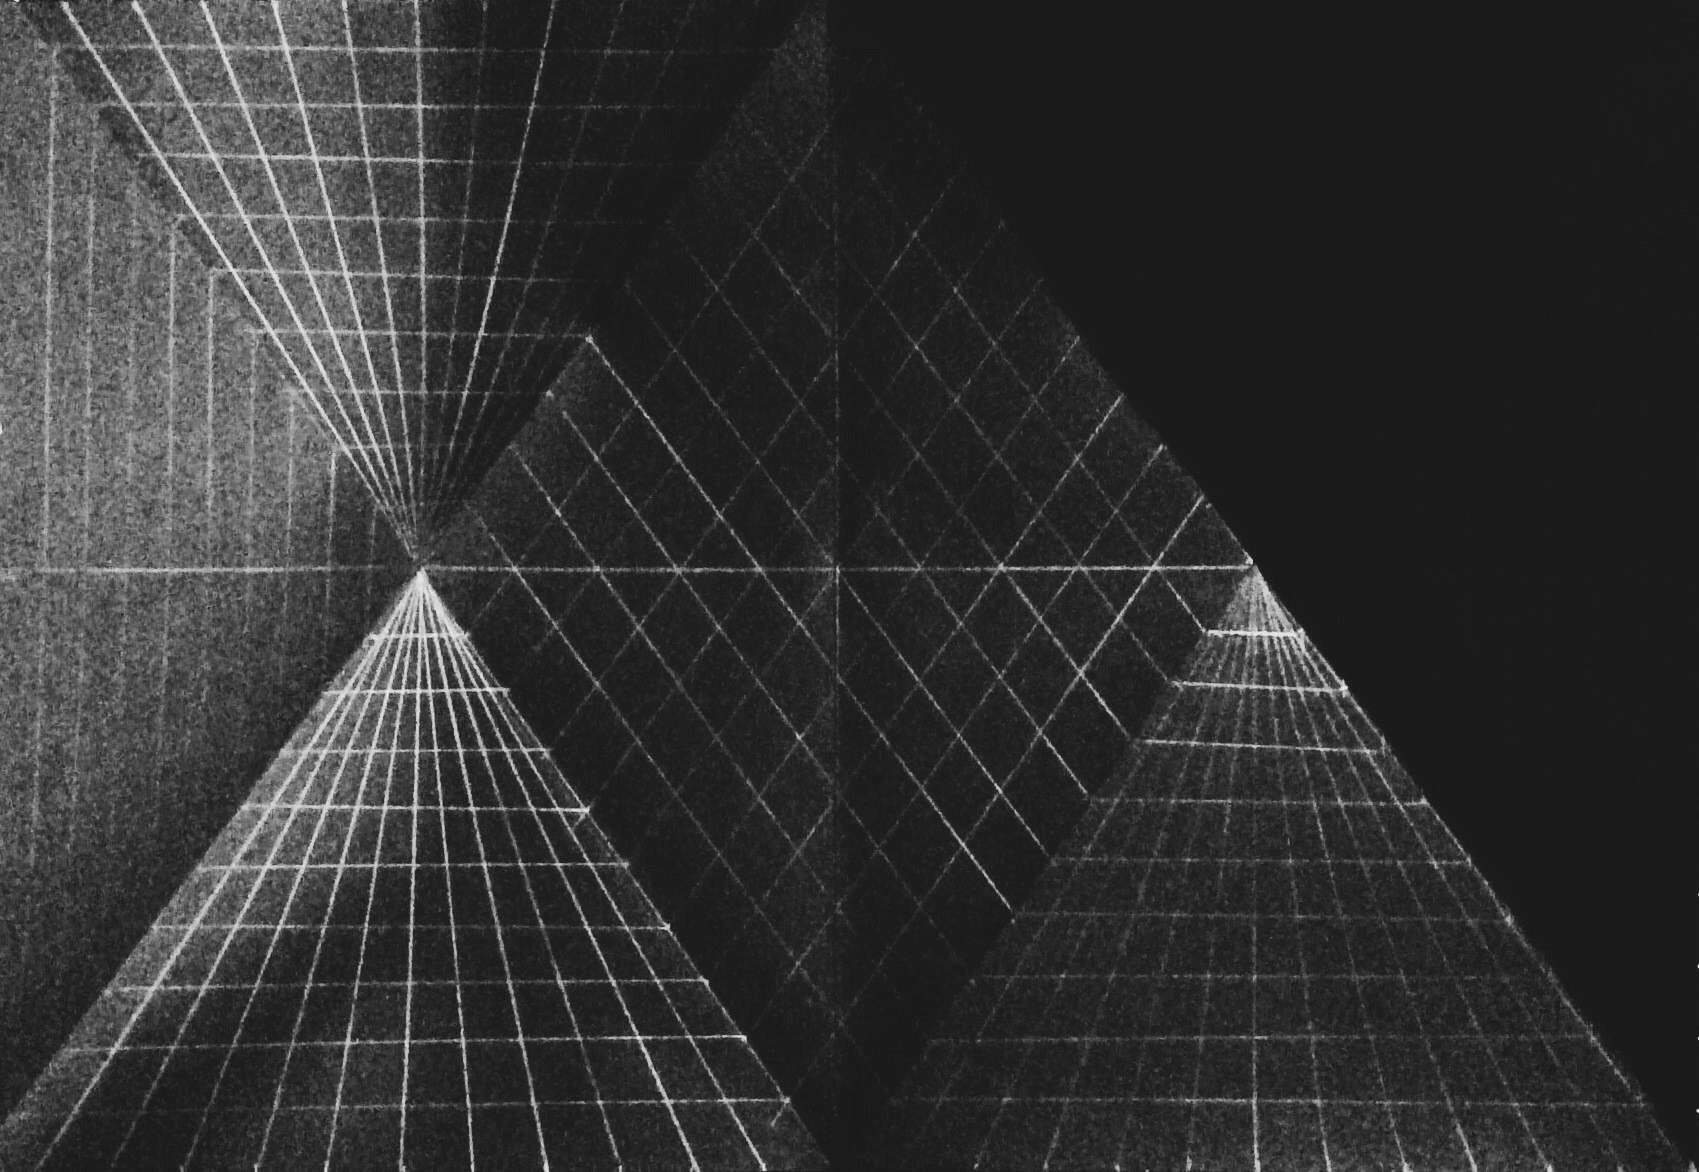 2014, reconfigurable sculpture variable dimensions